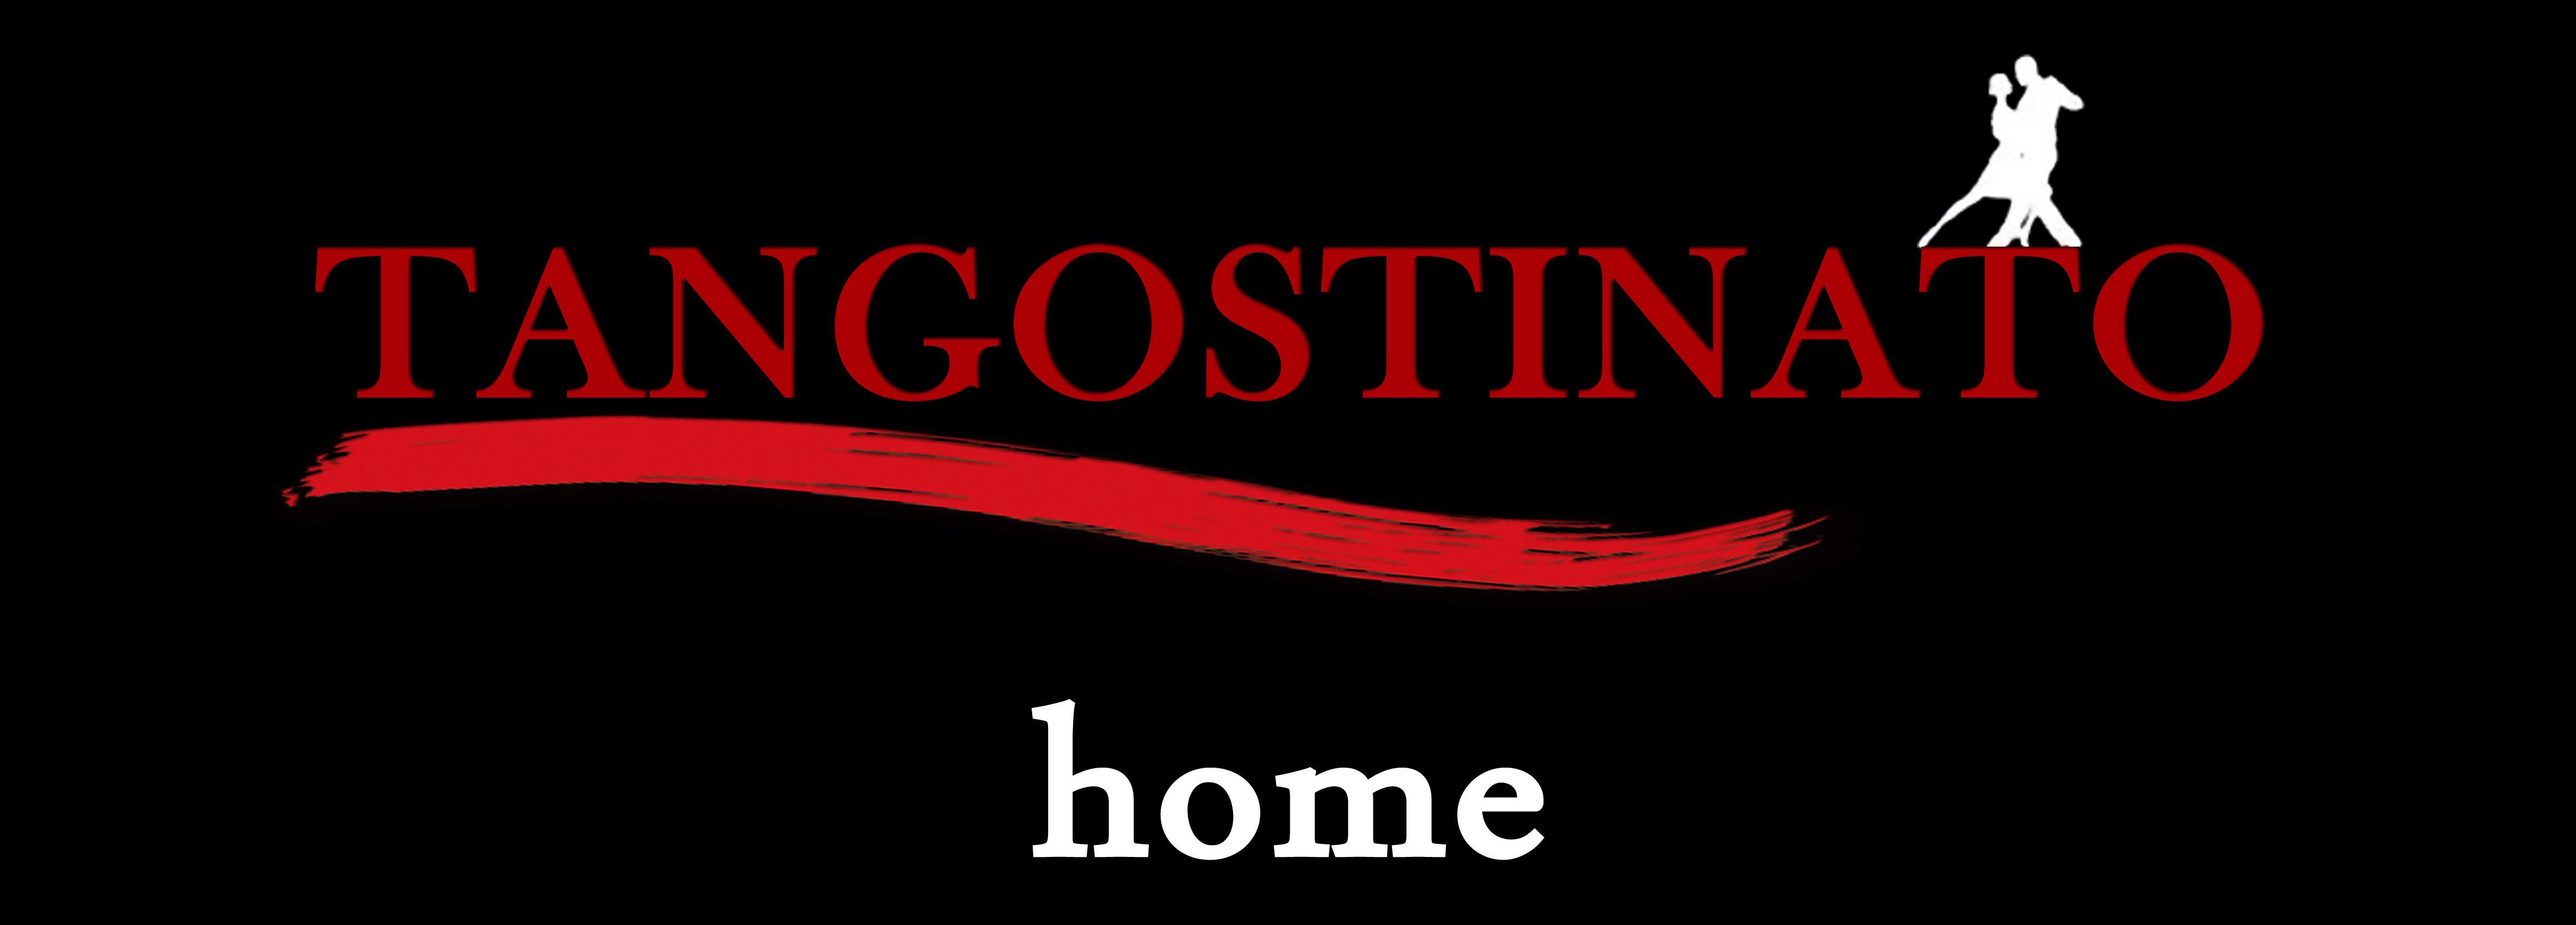 www.tangostinato.it